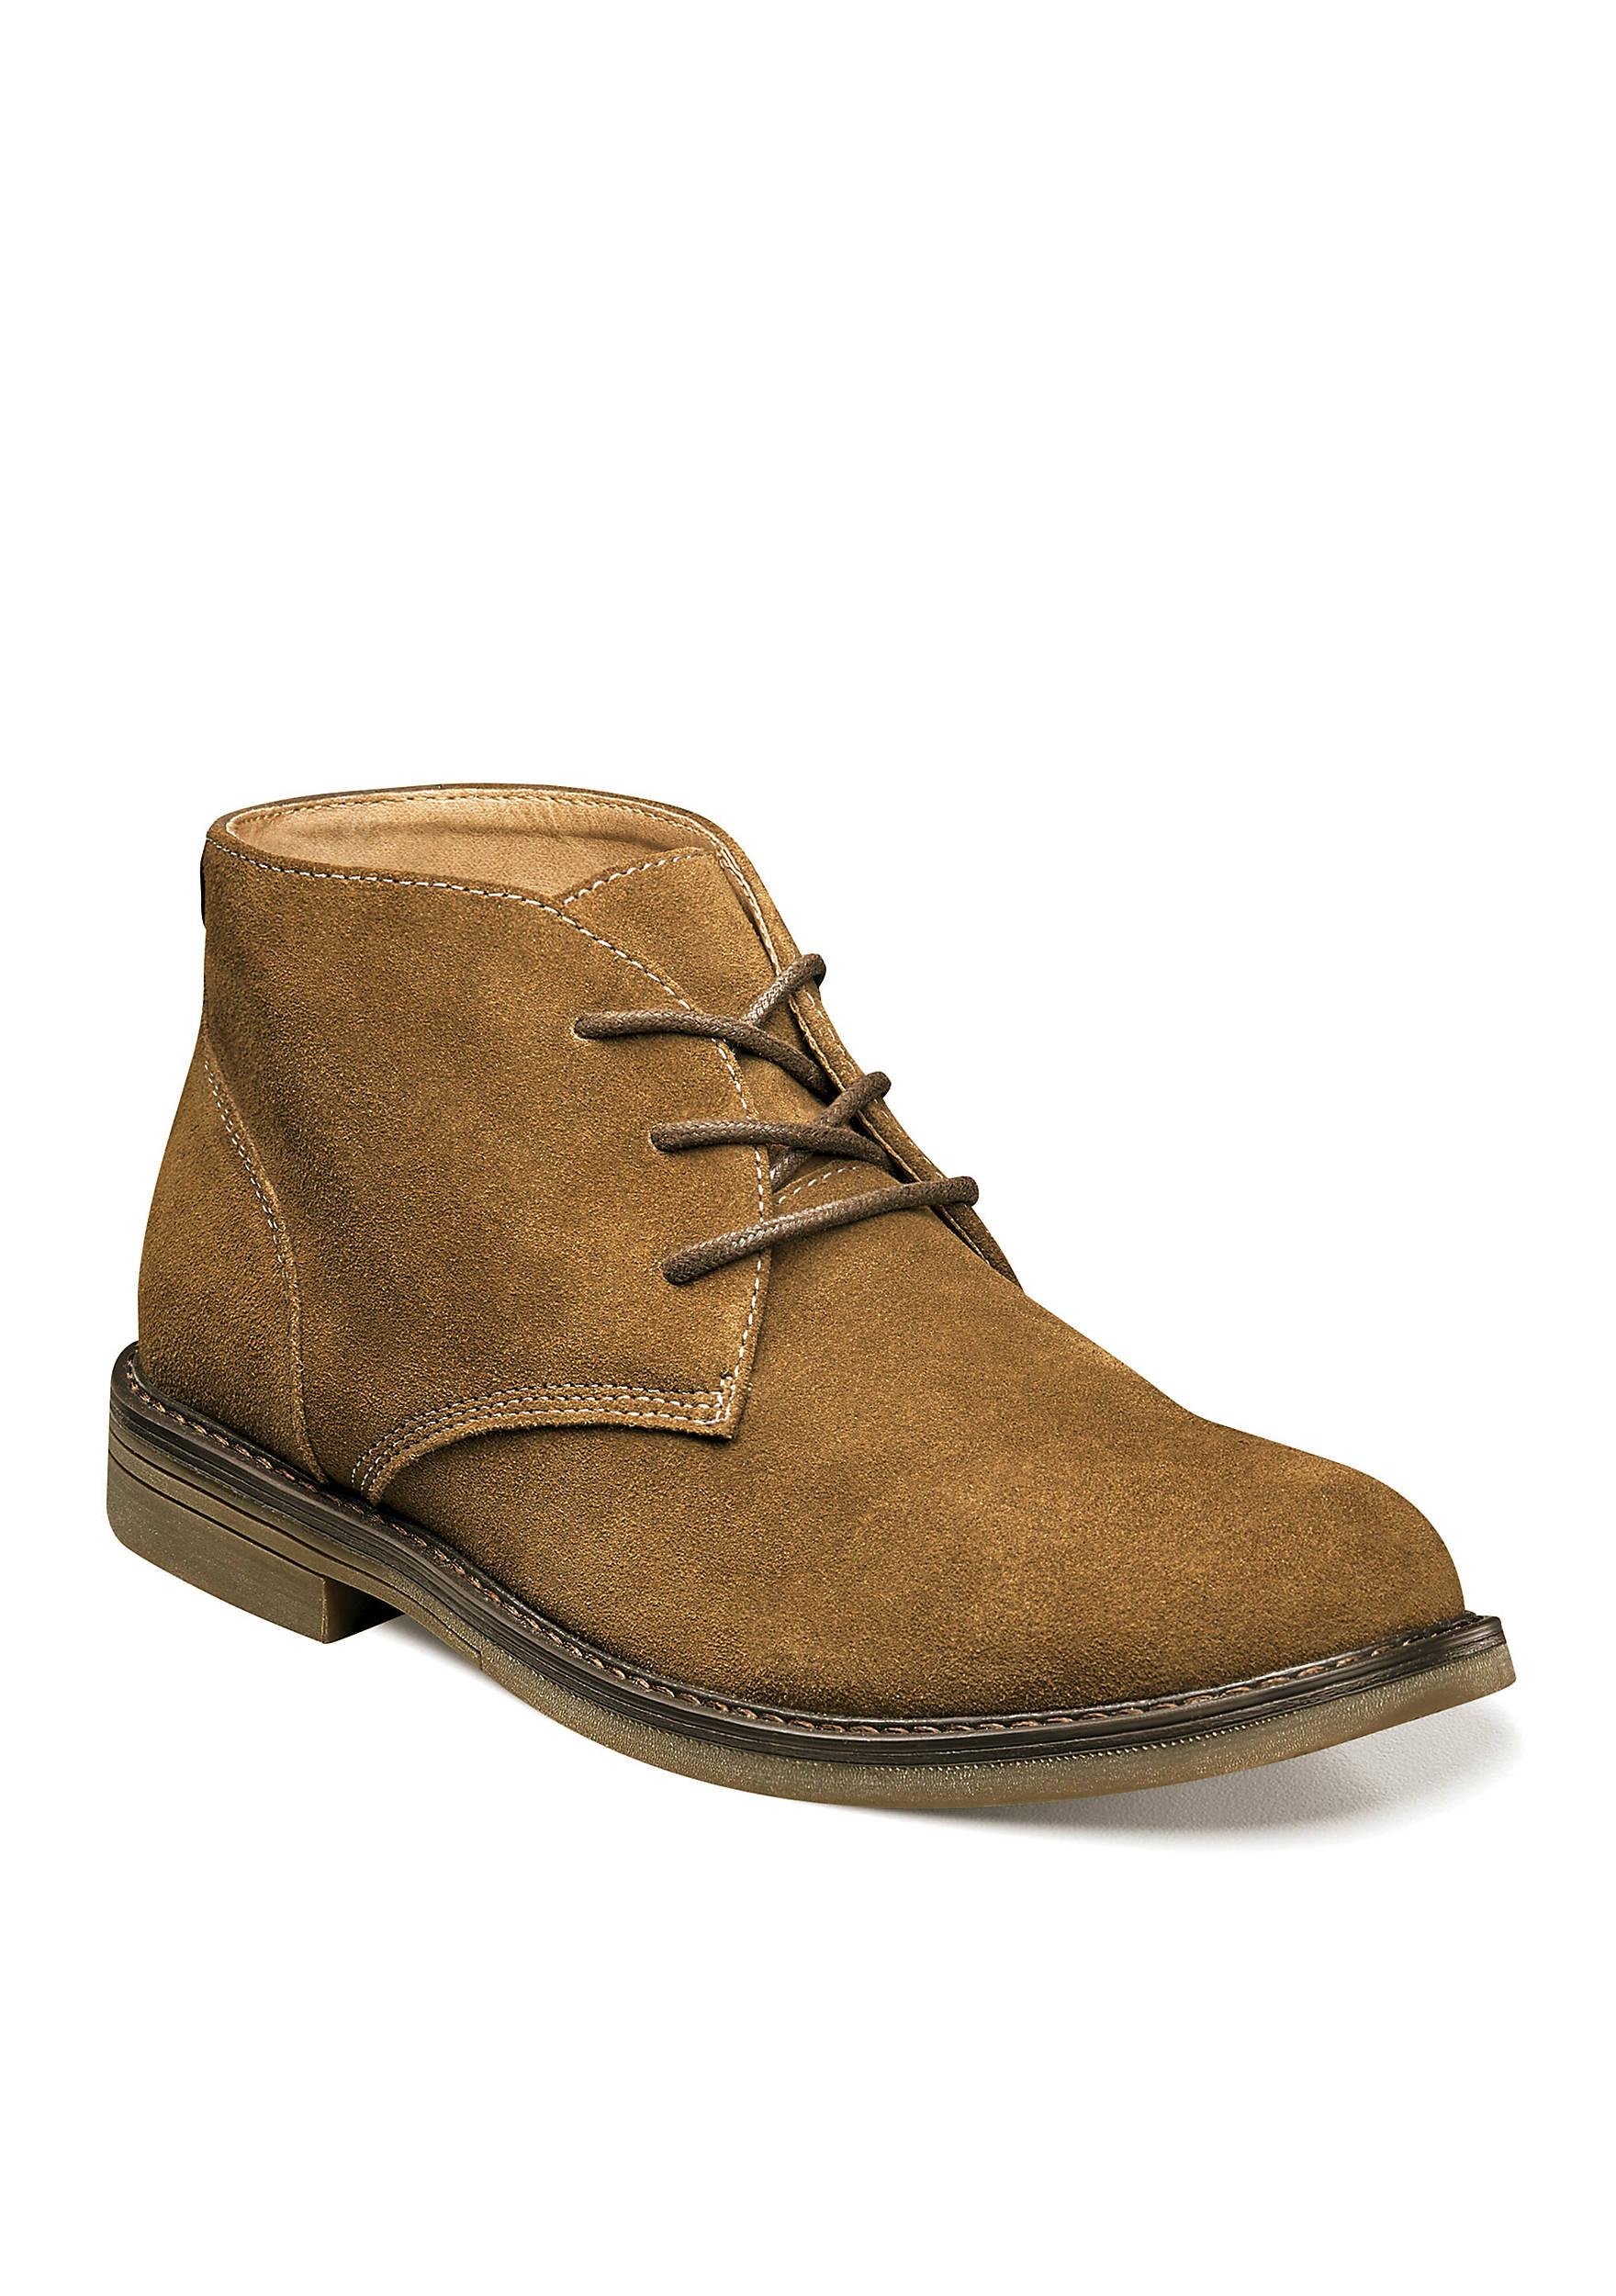 Lancaster Chukka Boot